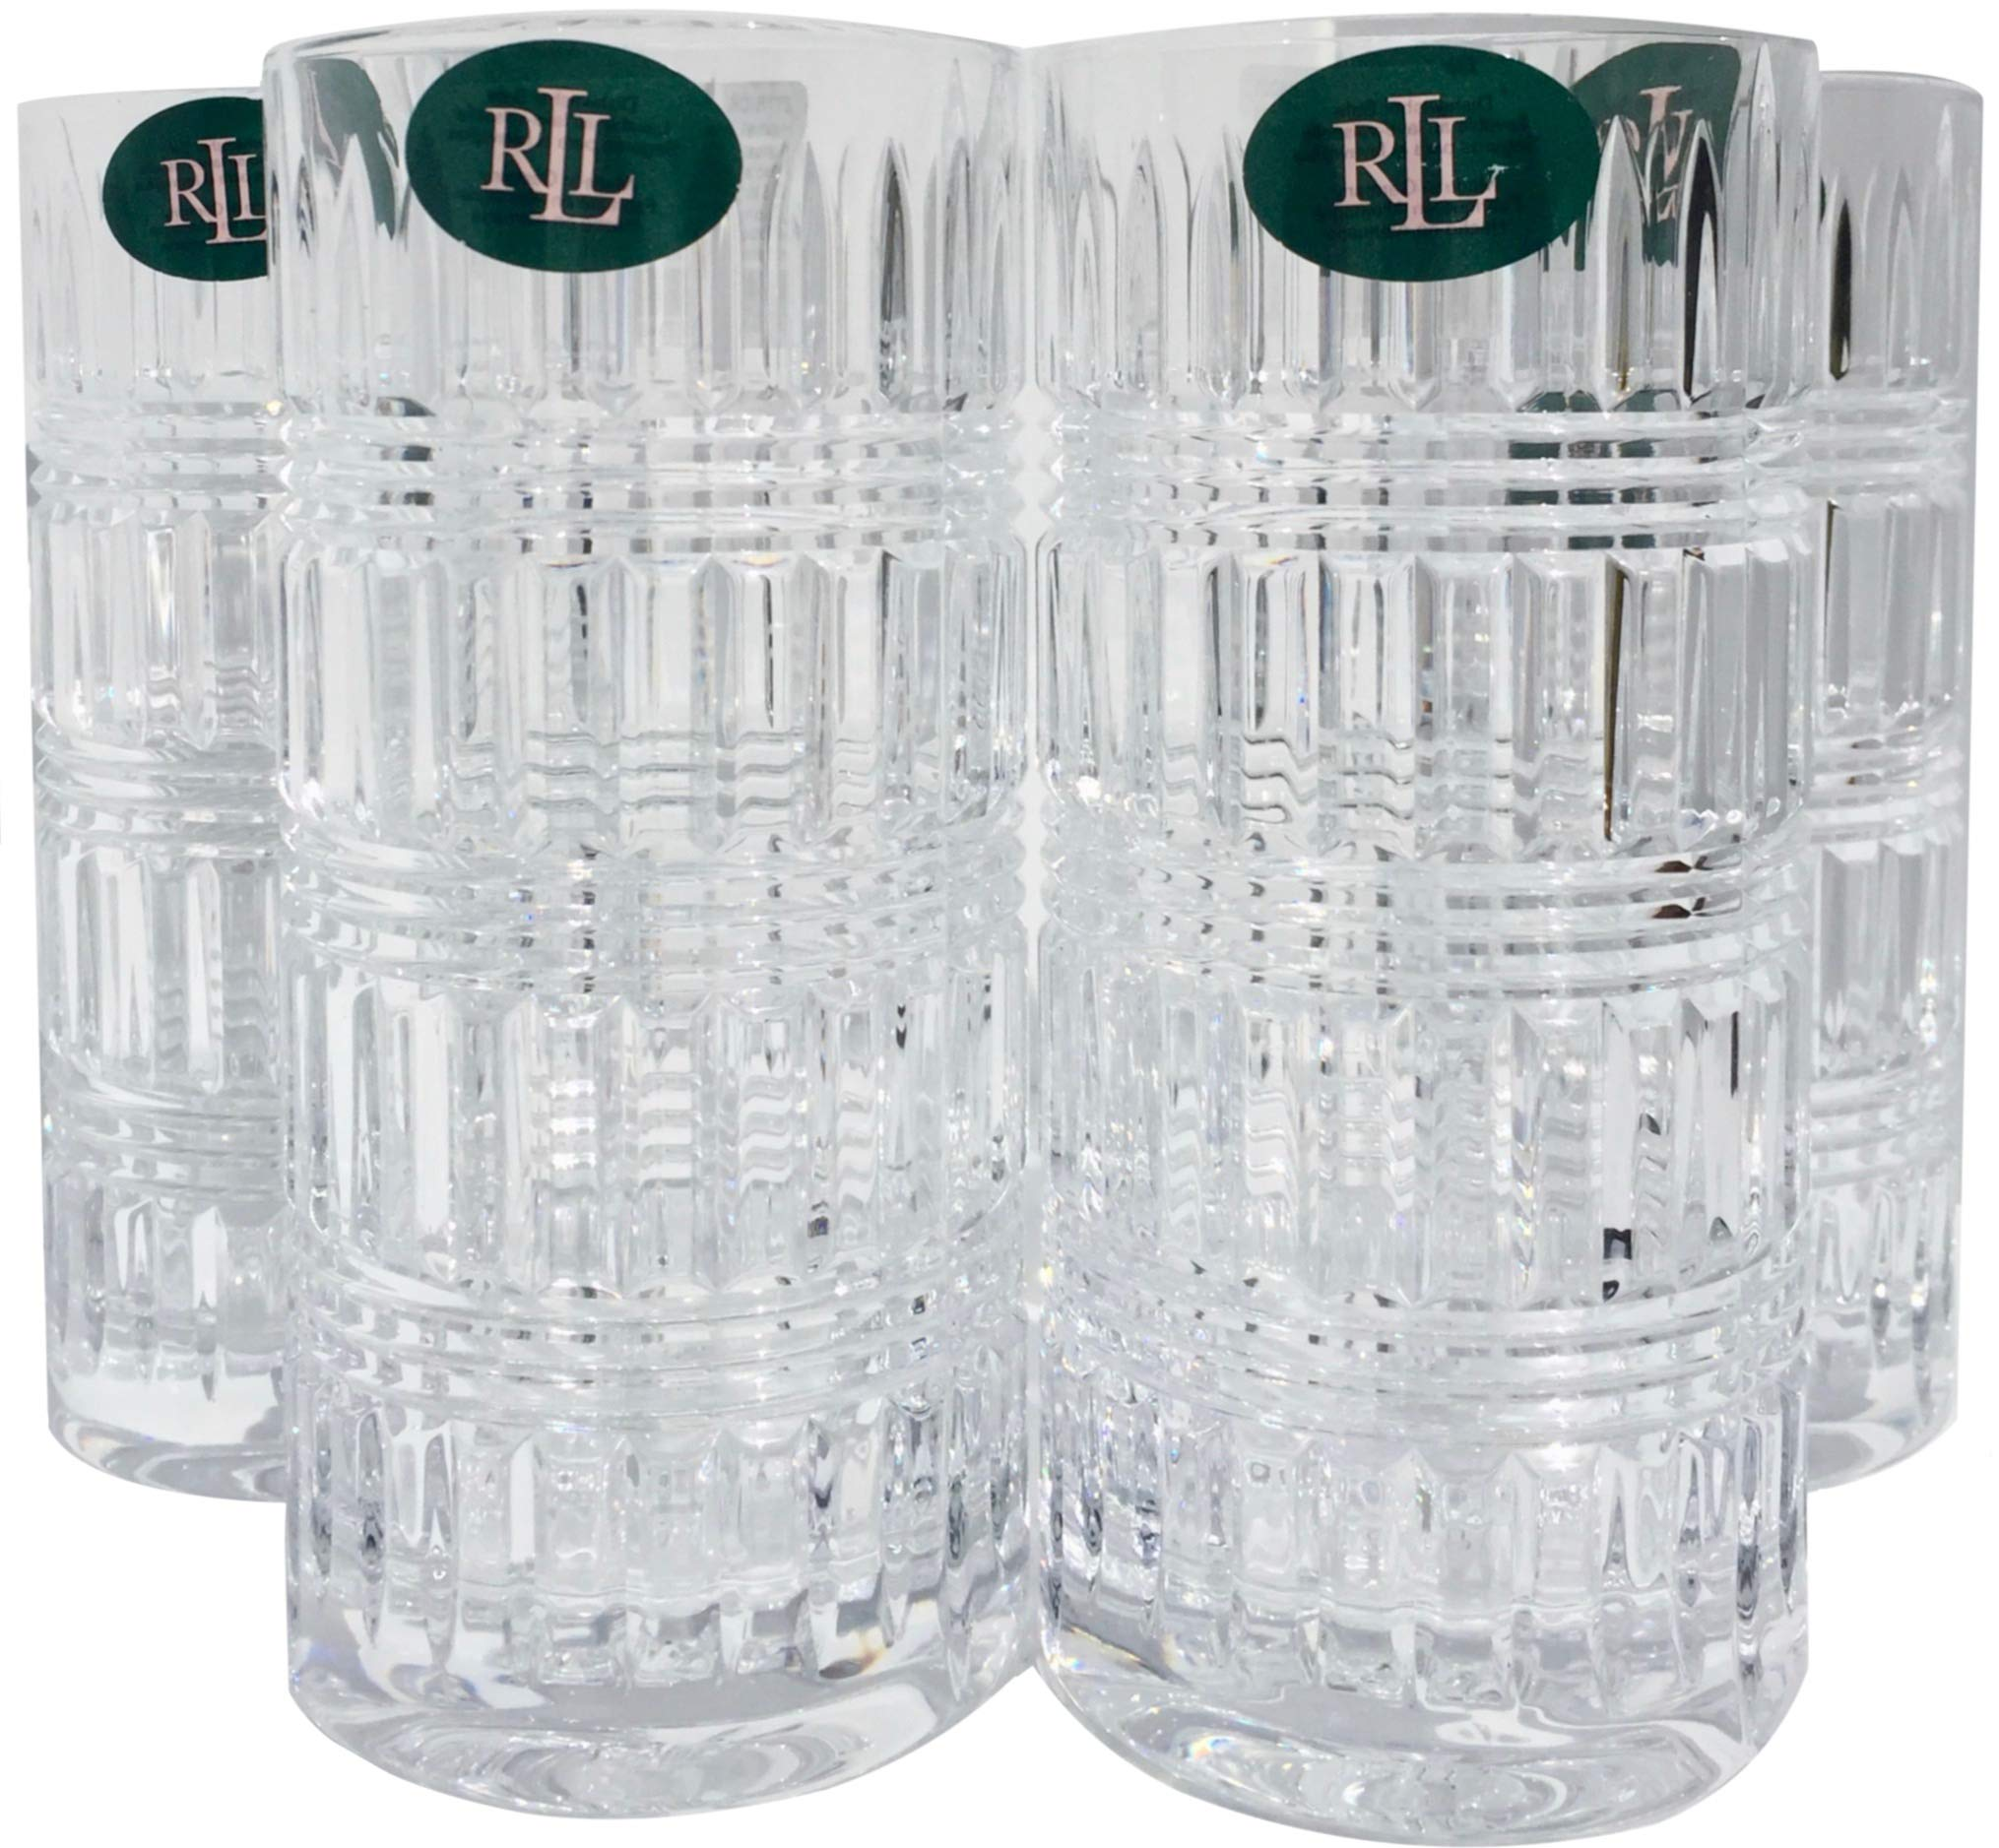 Lauren By RALPH LAUREN Ettrick Pattern Highball Drinkware Set of 4 Crystal Glasses 11.6 Ounces by Lauren by Ralph Lauren